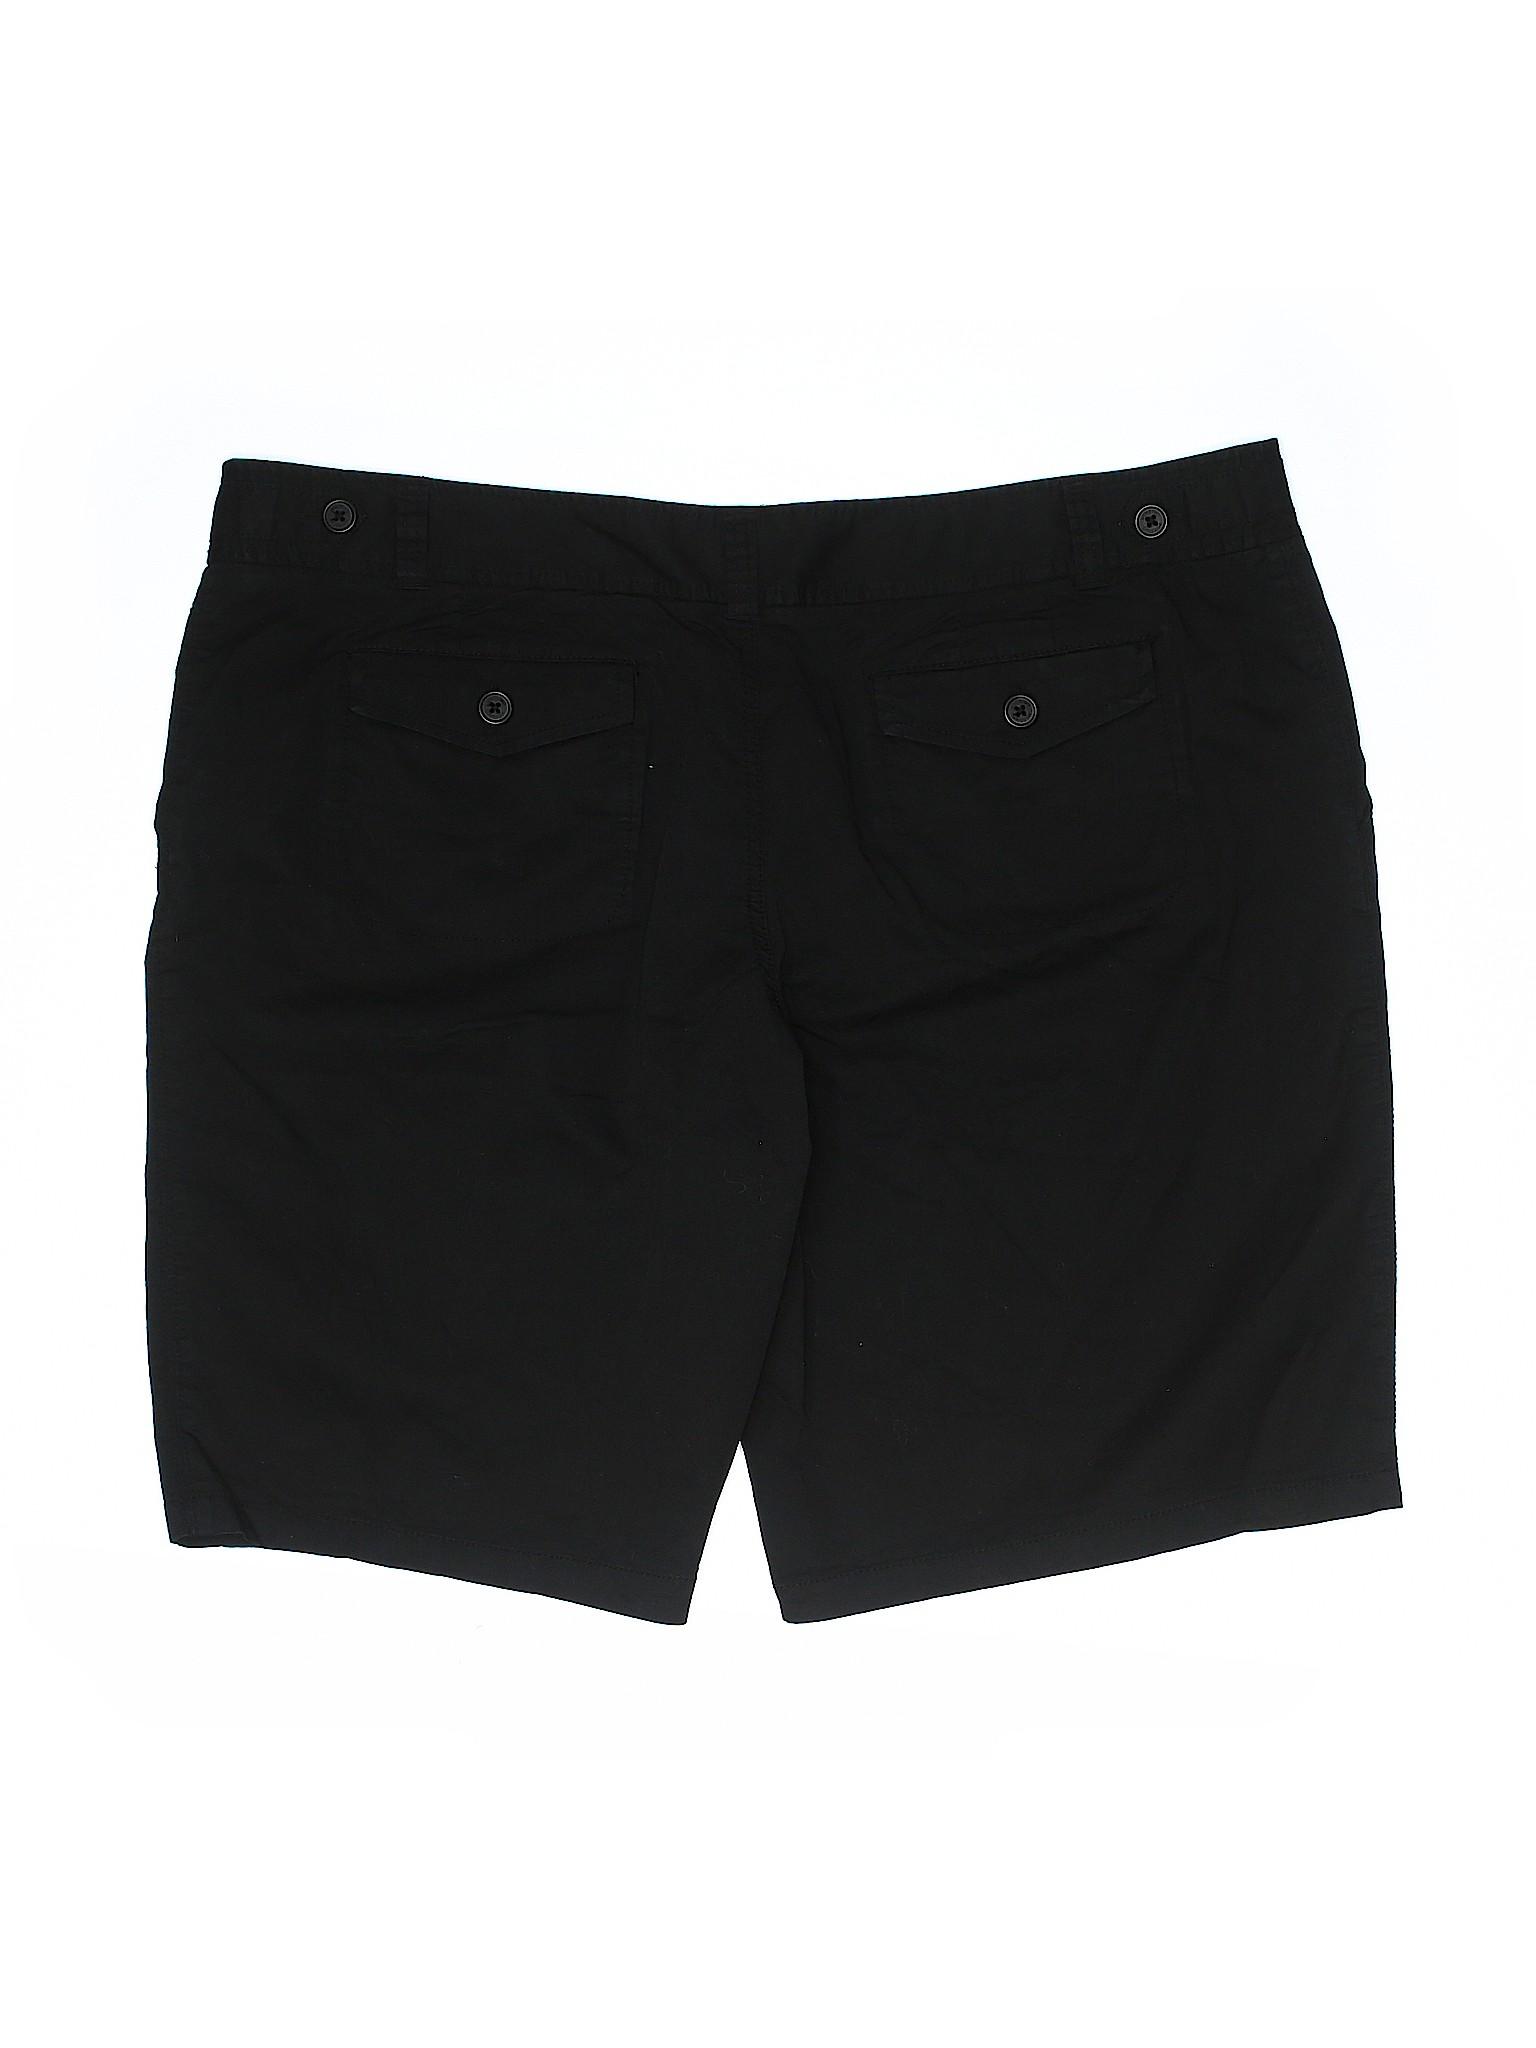 Khaki Boutique Mossimo Boutique Shorts Mossimo Khaki Shorts xPB0wfxqv